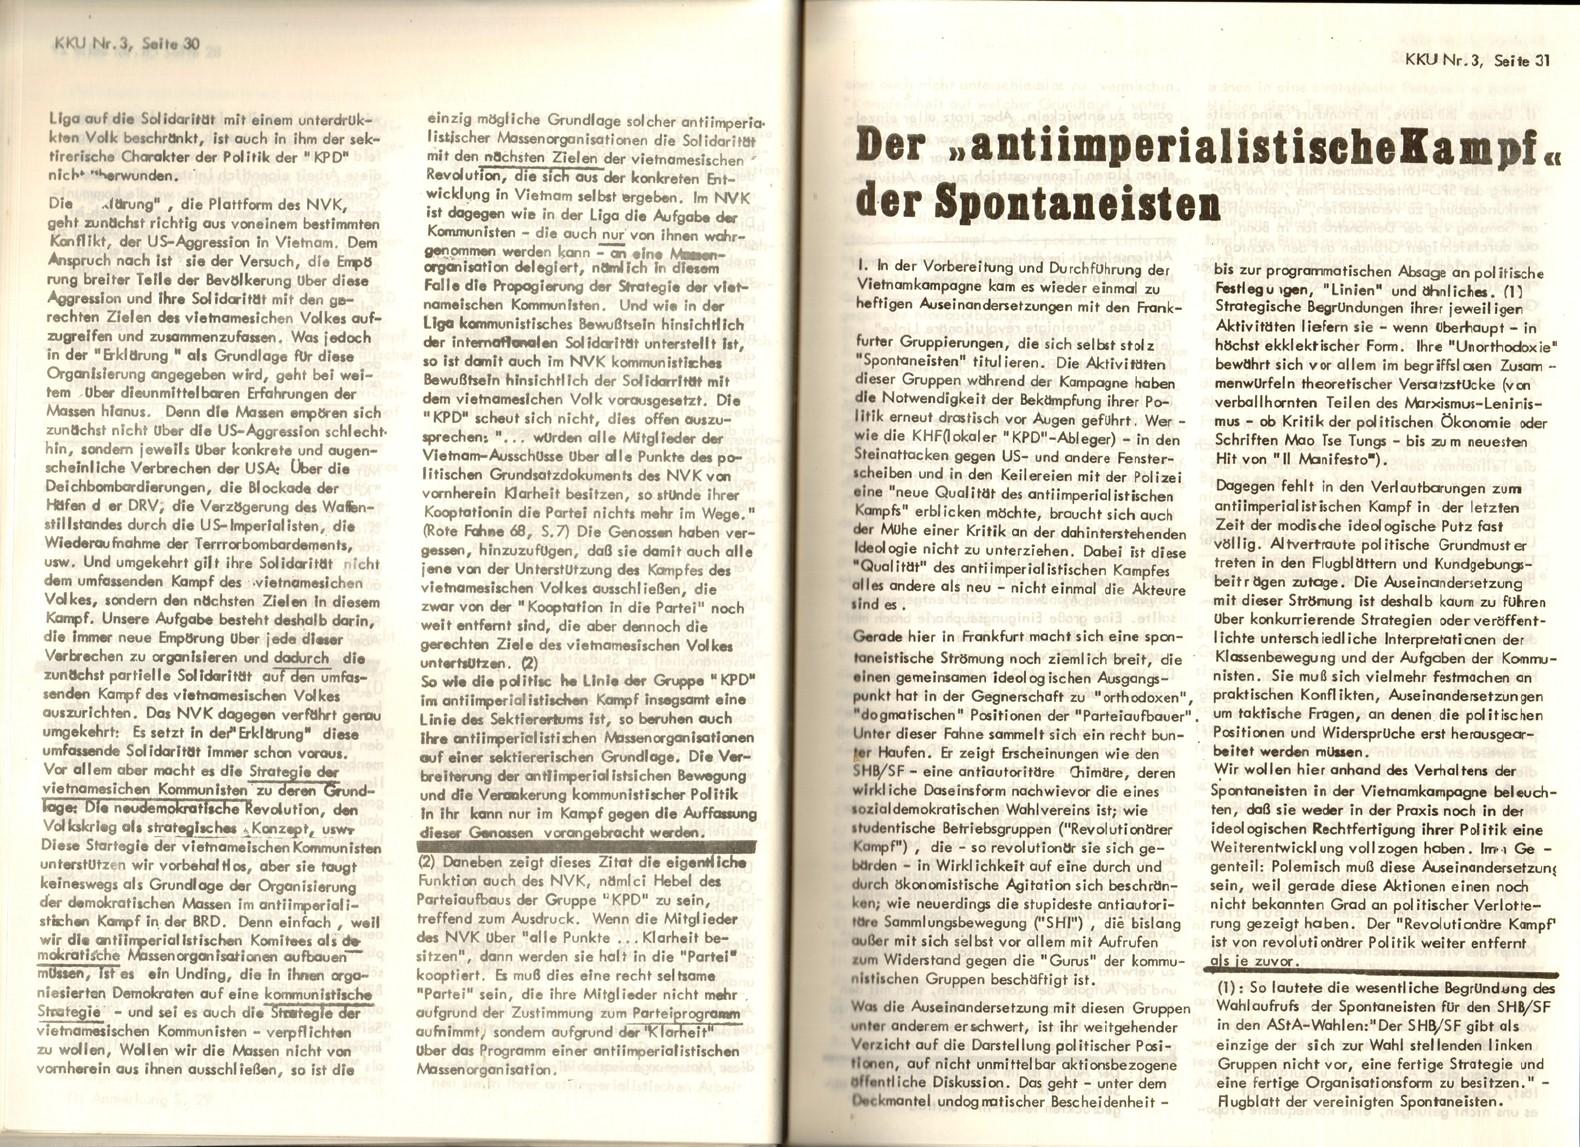 Frankfurt_Offenbach_KG_Kampf_Kritik_Umgestaltung_1973_03_17